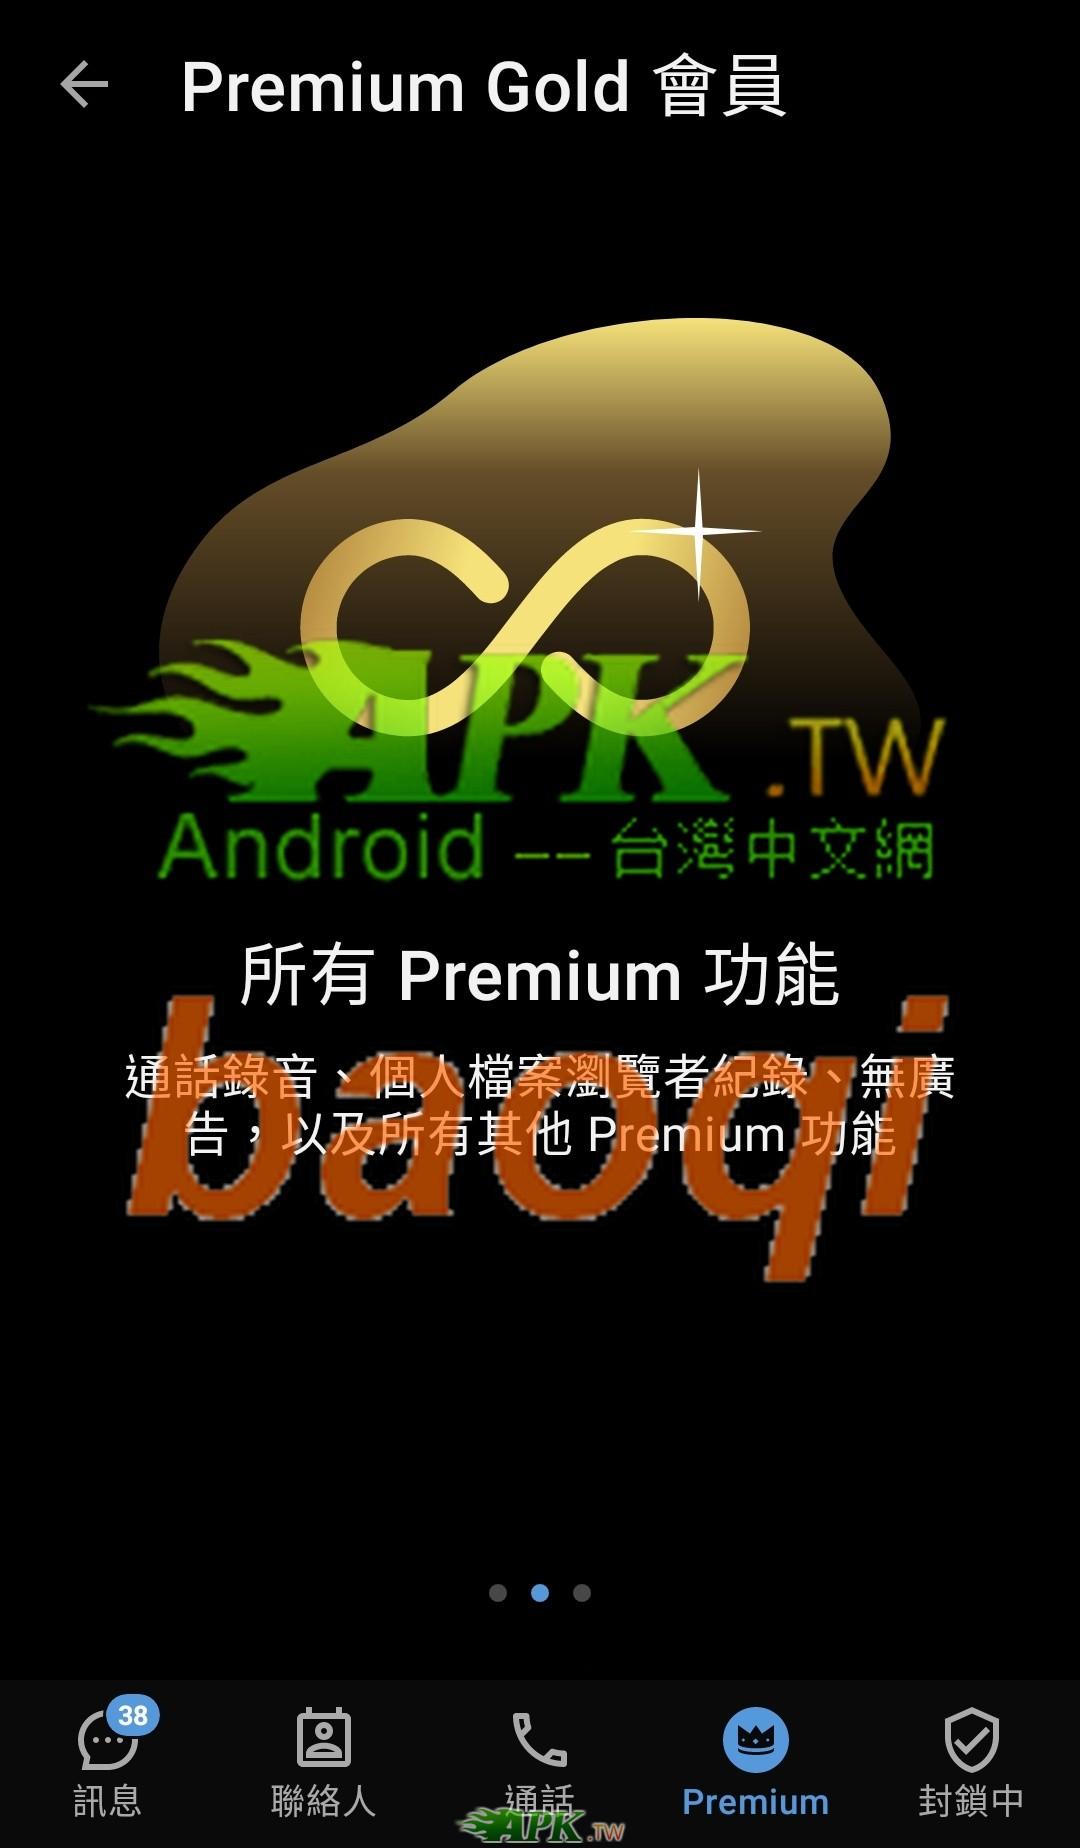 Truecaller_Premium_4_DARK_.jpg